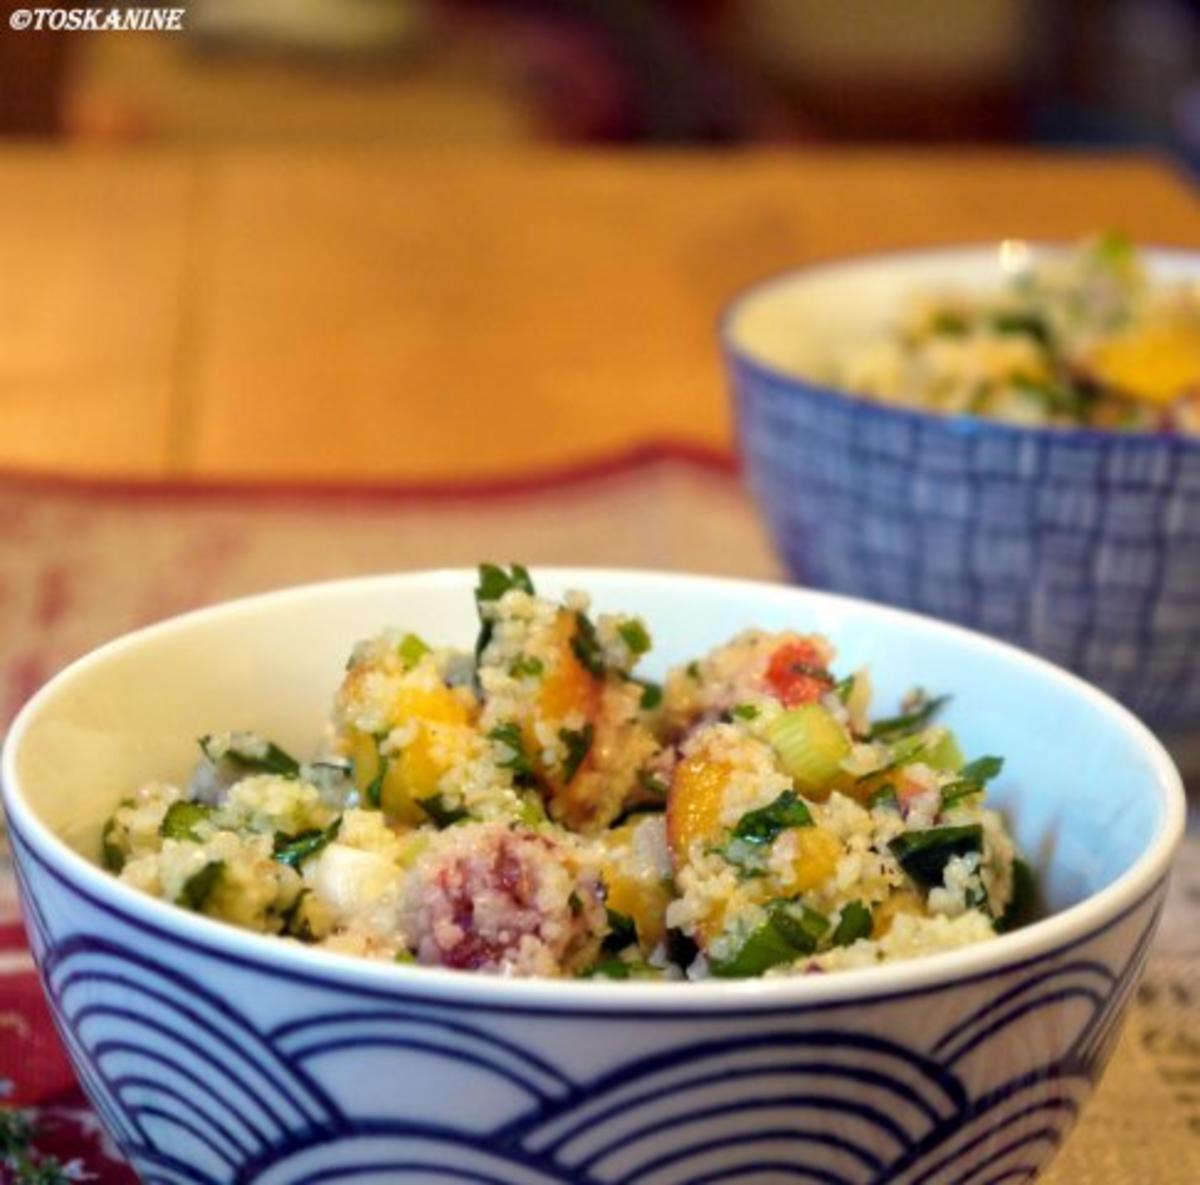 pfirsich bulgur salat rezept mit bild. Black Bedroom Furniture Sets. Home Design Ideas